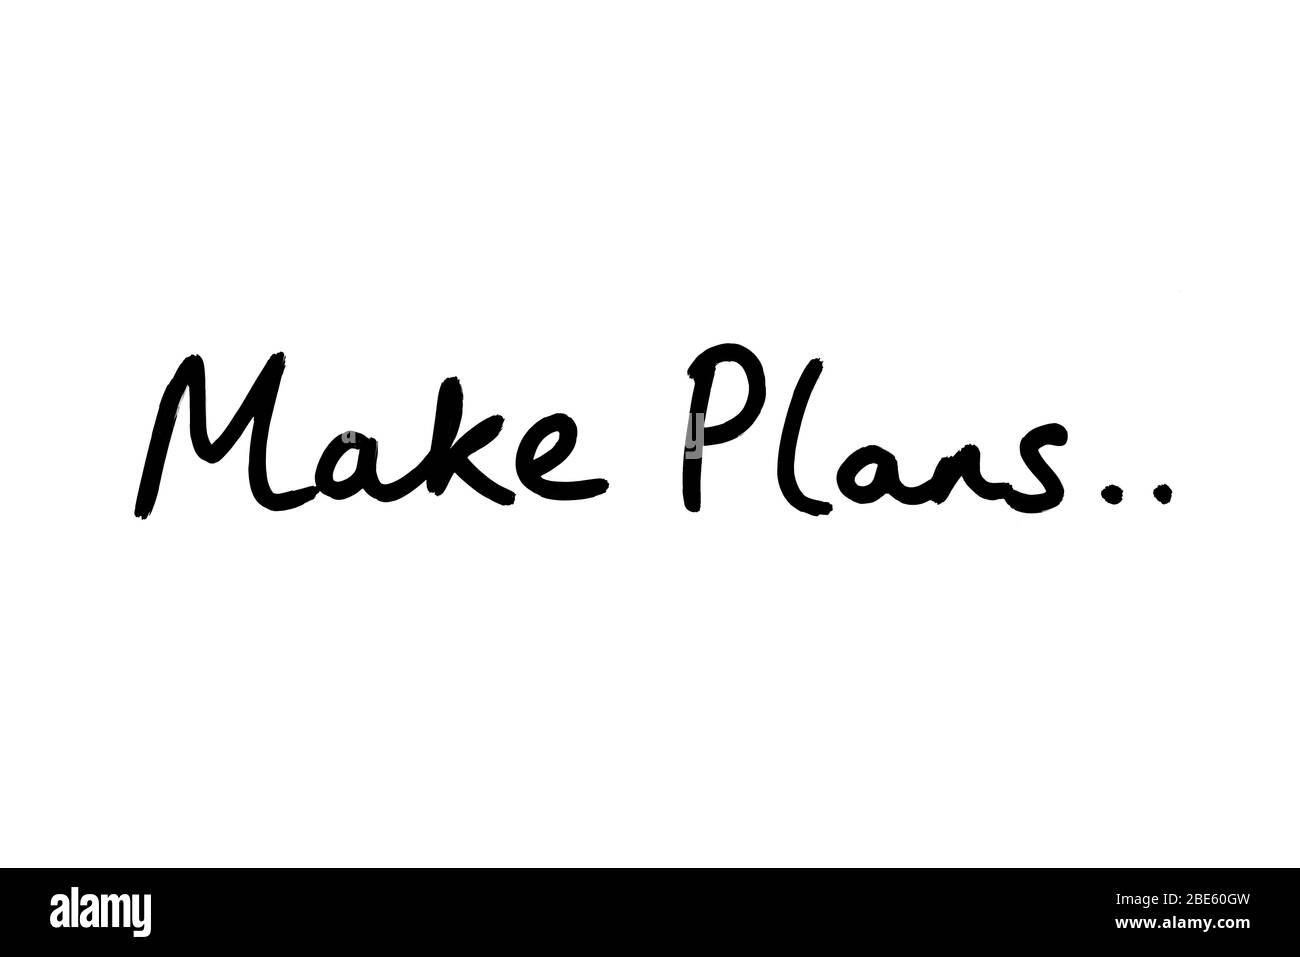 Make Plans.. handwritten on a white background. Stock Photo